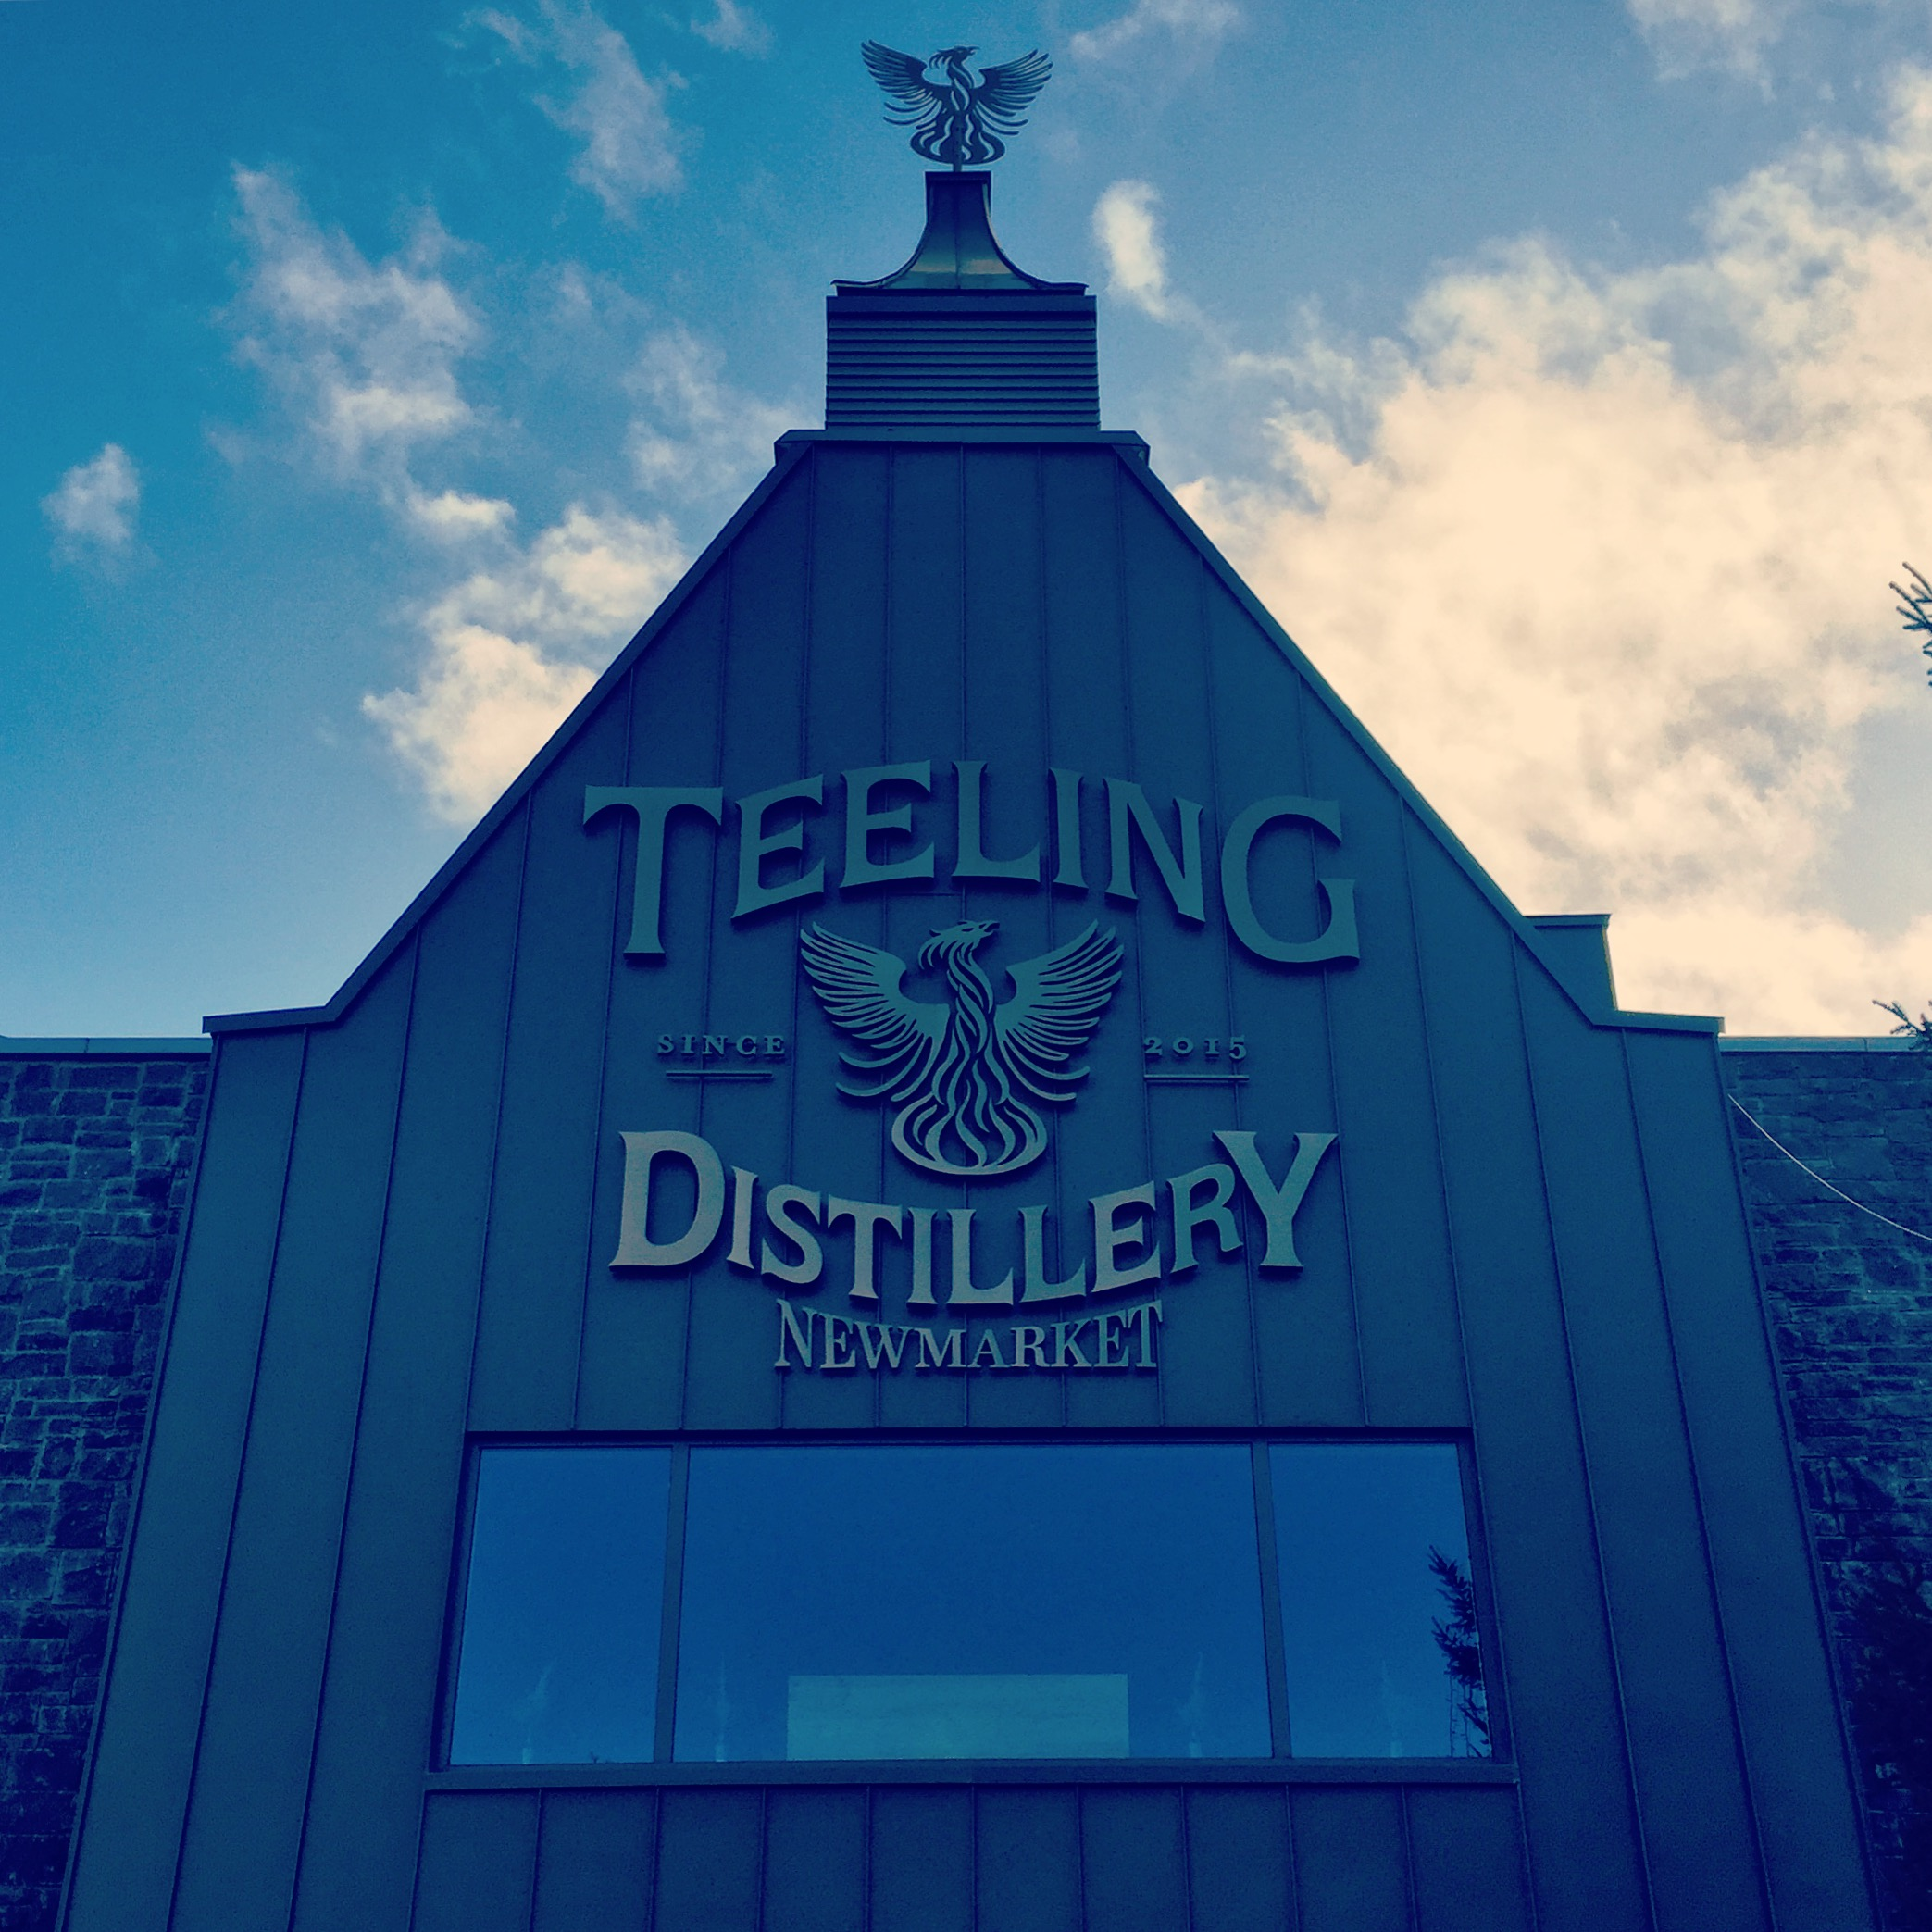 1. Teeling Whiskey -